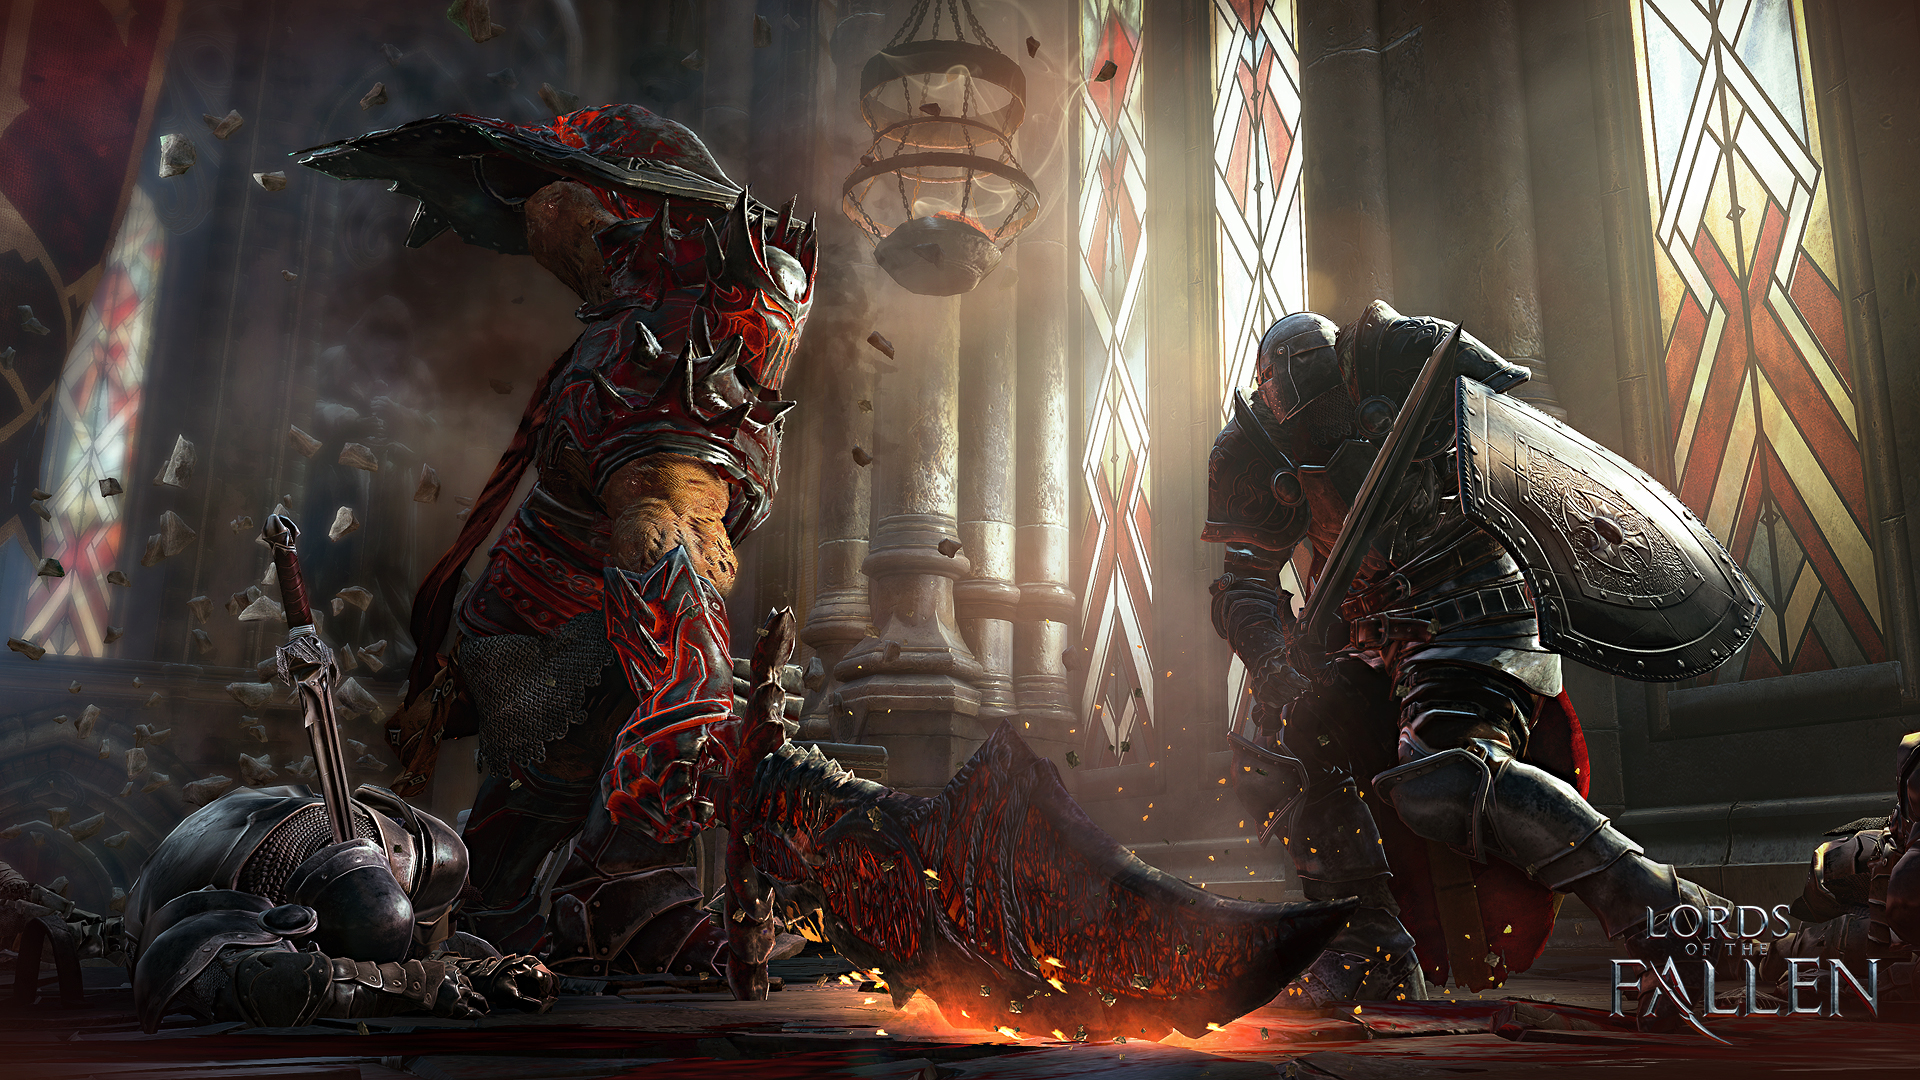 Lords of Fallen 2 برای رایانههای شخصی و کنسولهای نسل نهمی در دست ساخت قرار دارد